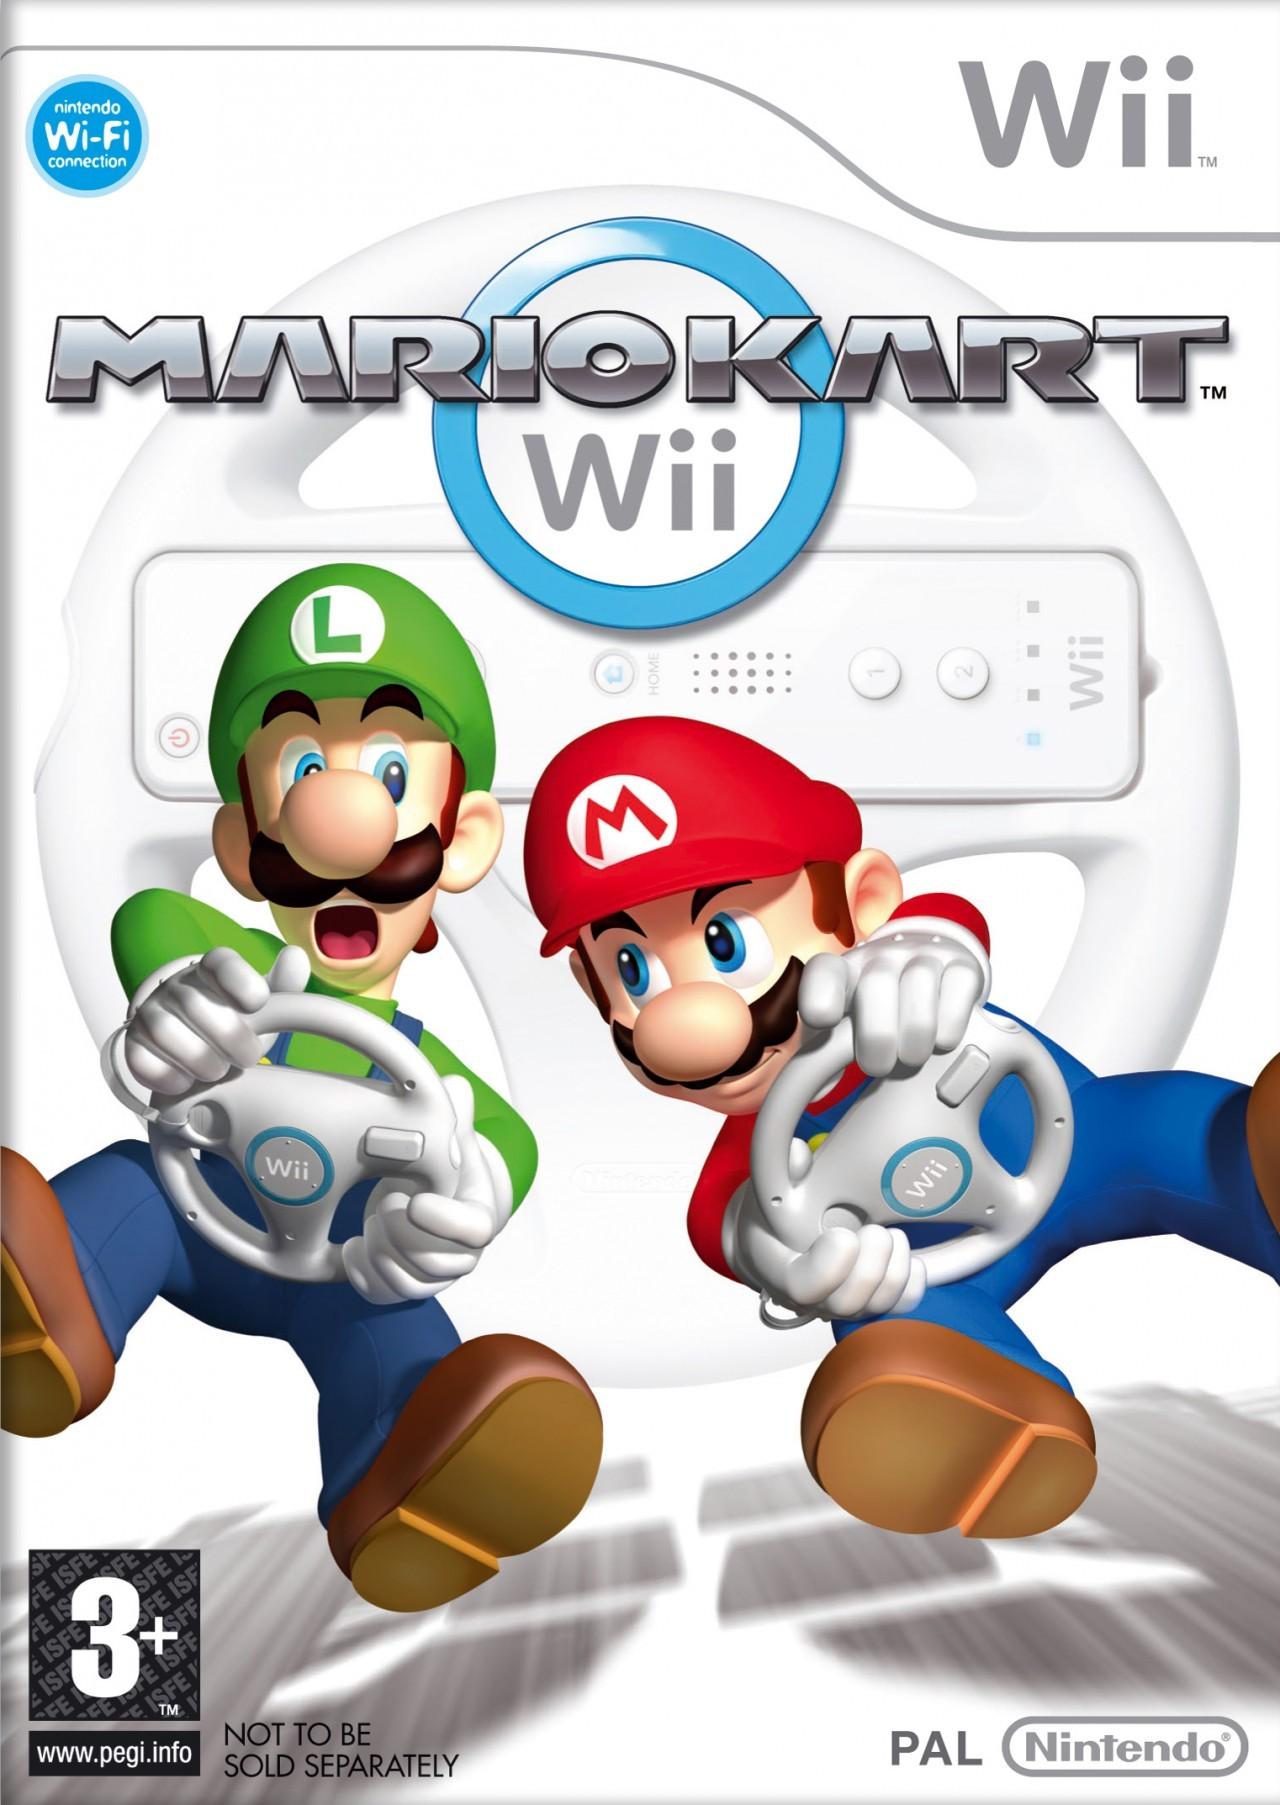 Mario Kart Wii Comment Avoir Harmonie